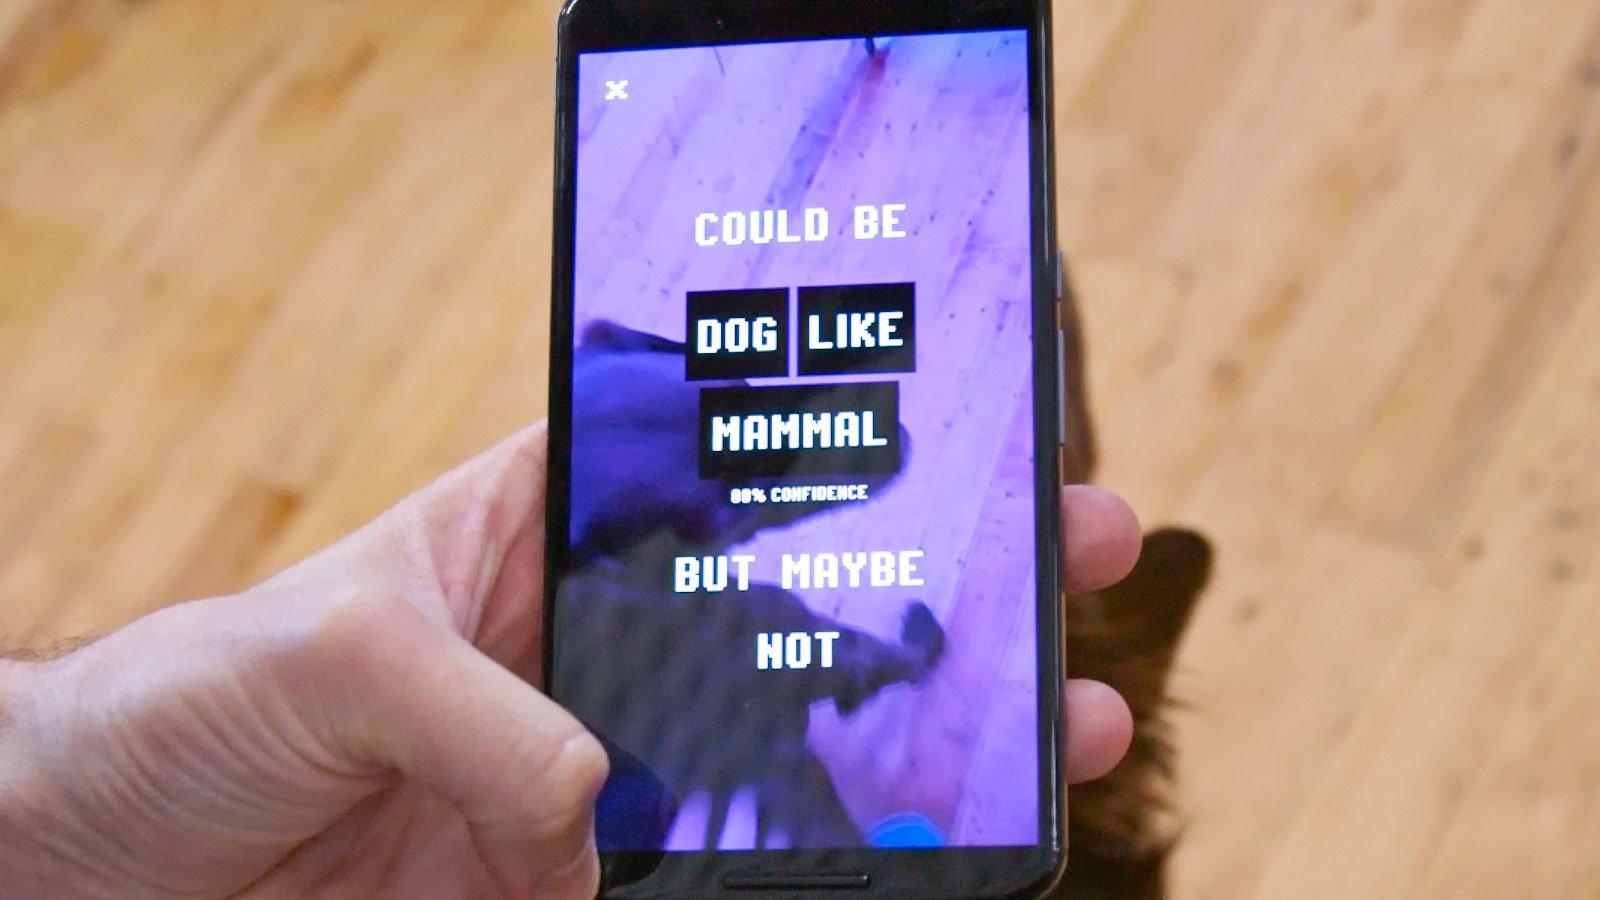 Google Traduttore ora si basa su un sistema di reti neurali